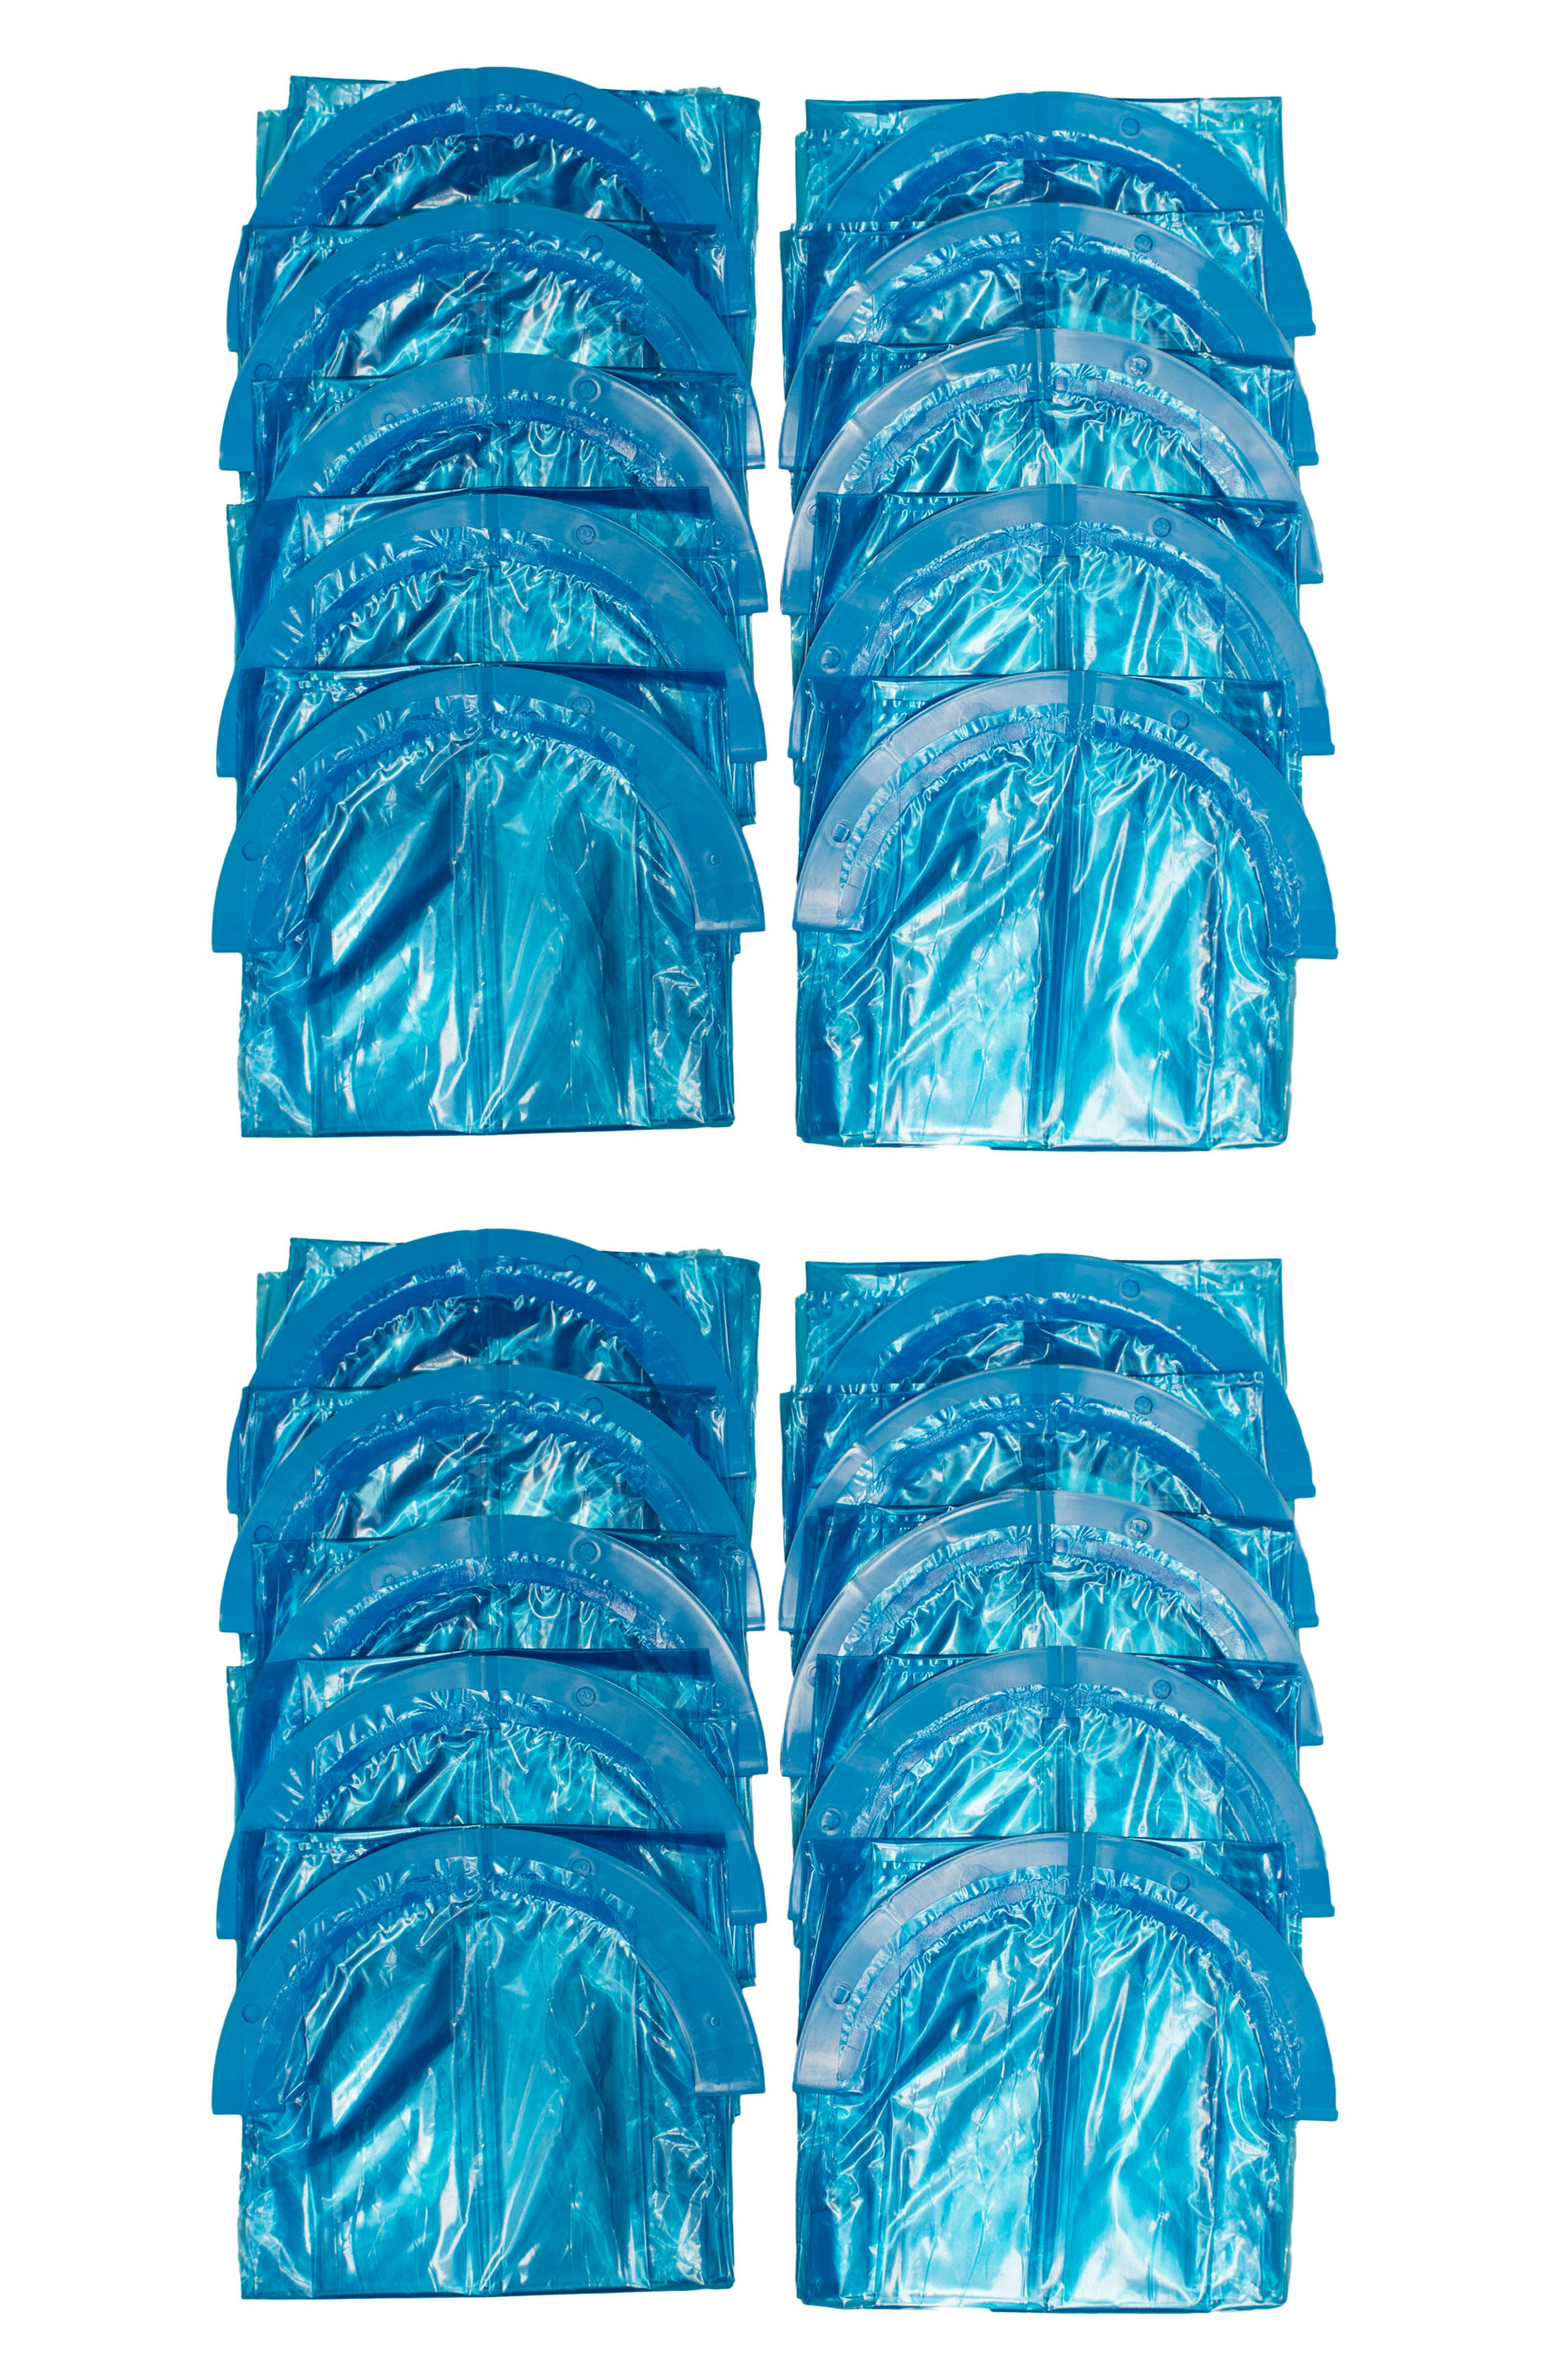 Prince Lionheart Twist'r Diaper Disposal System Refill Bags Set of 20